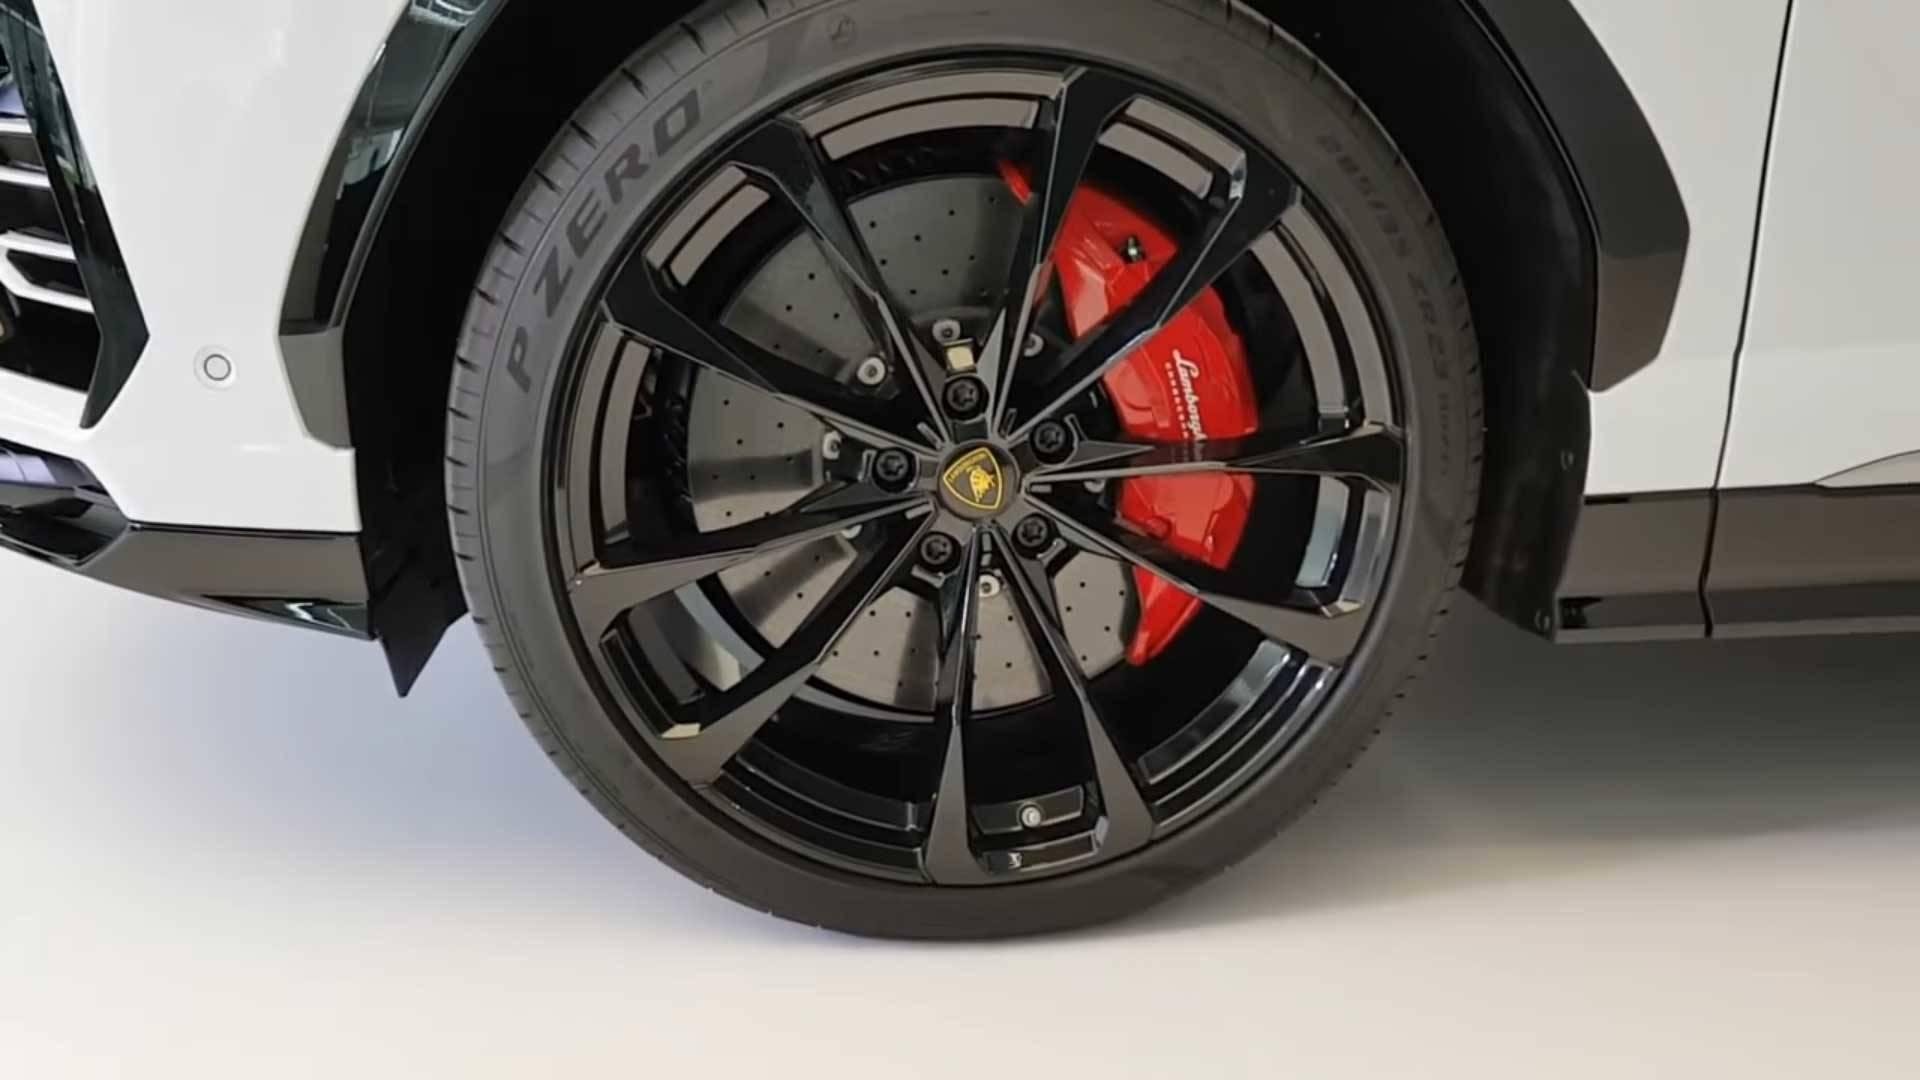 Take The Most In Depth Look Yet At The Lamborghini Urus